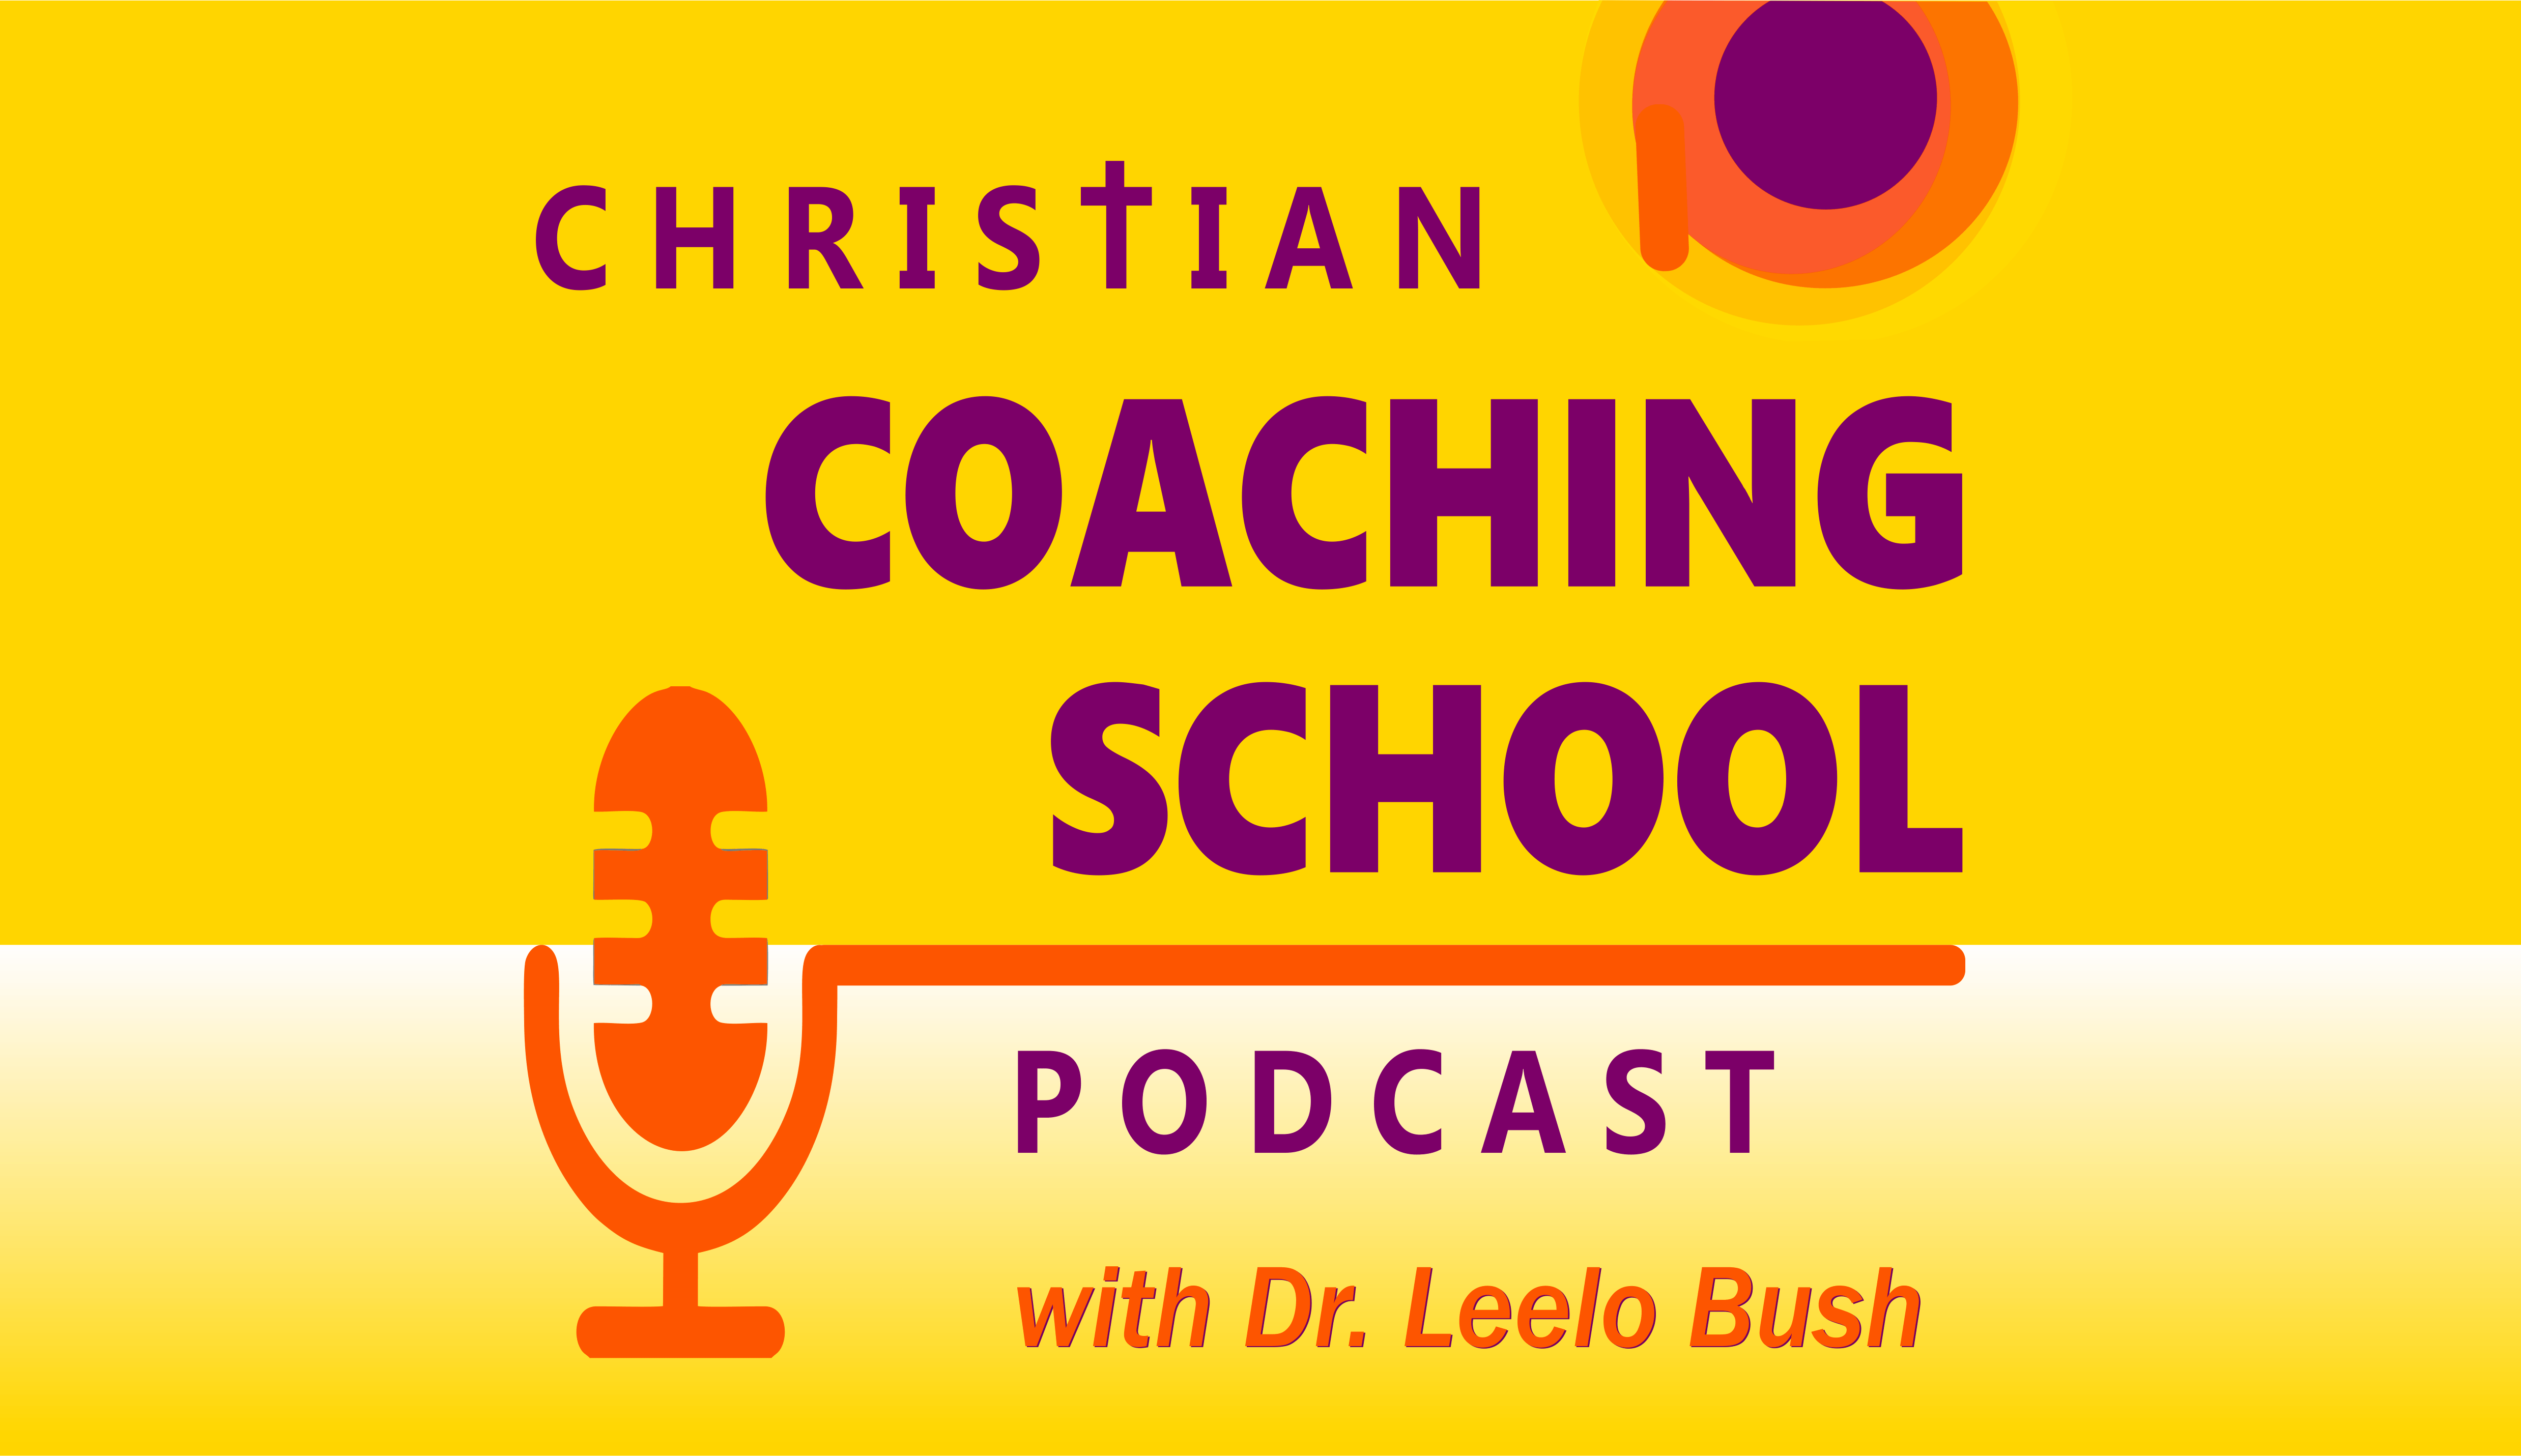 Christian Coaching School Podcast - new art Oct 2018